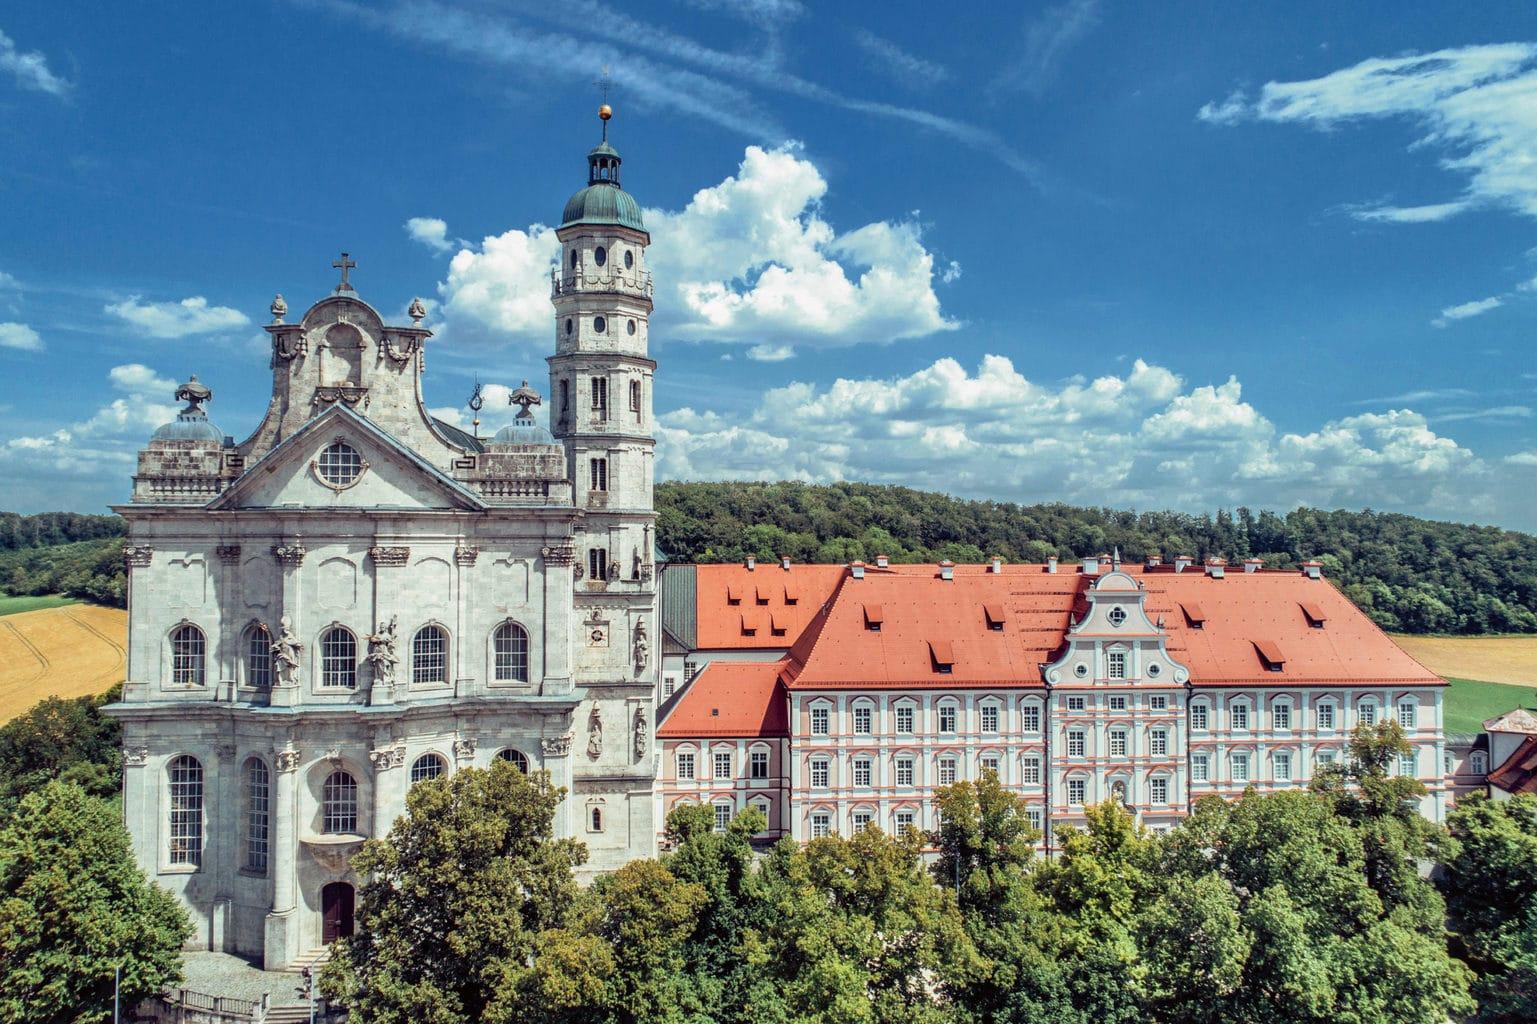 Klooster Neresheim in Baden-Württemberg met schitterende klooster